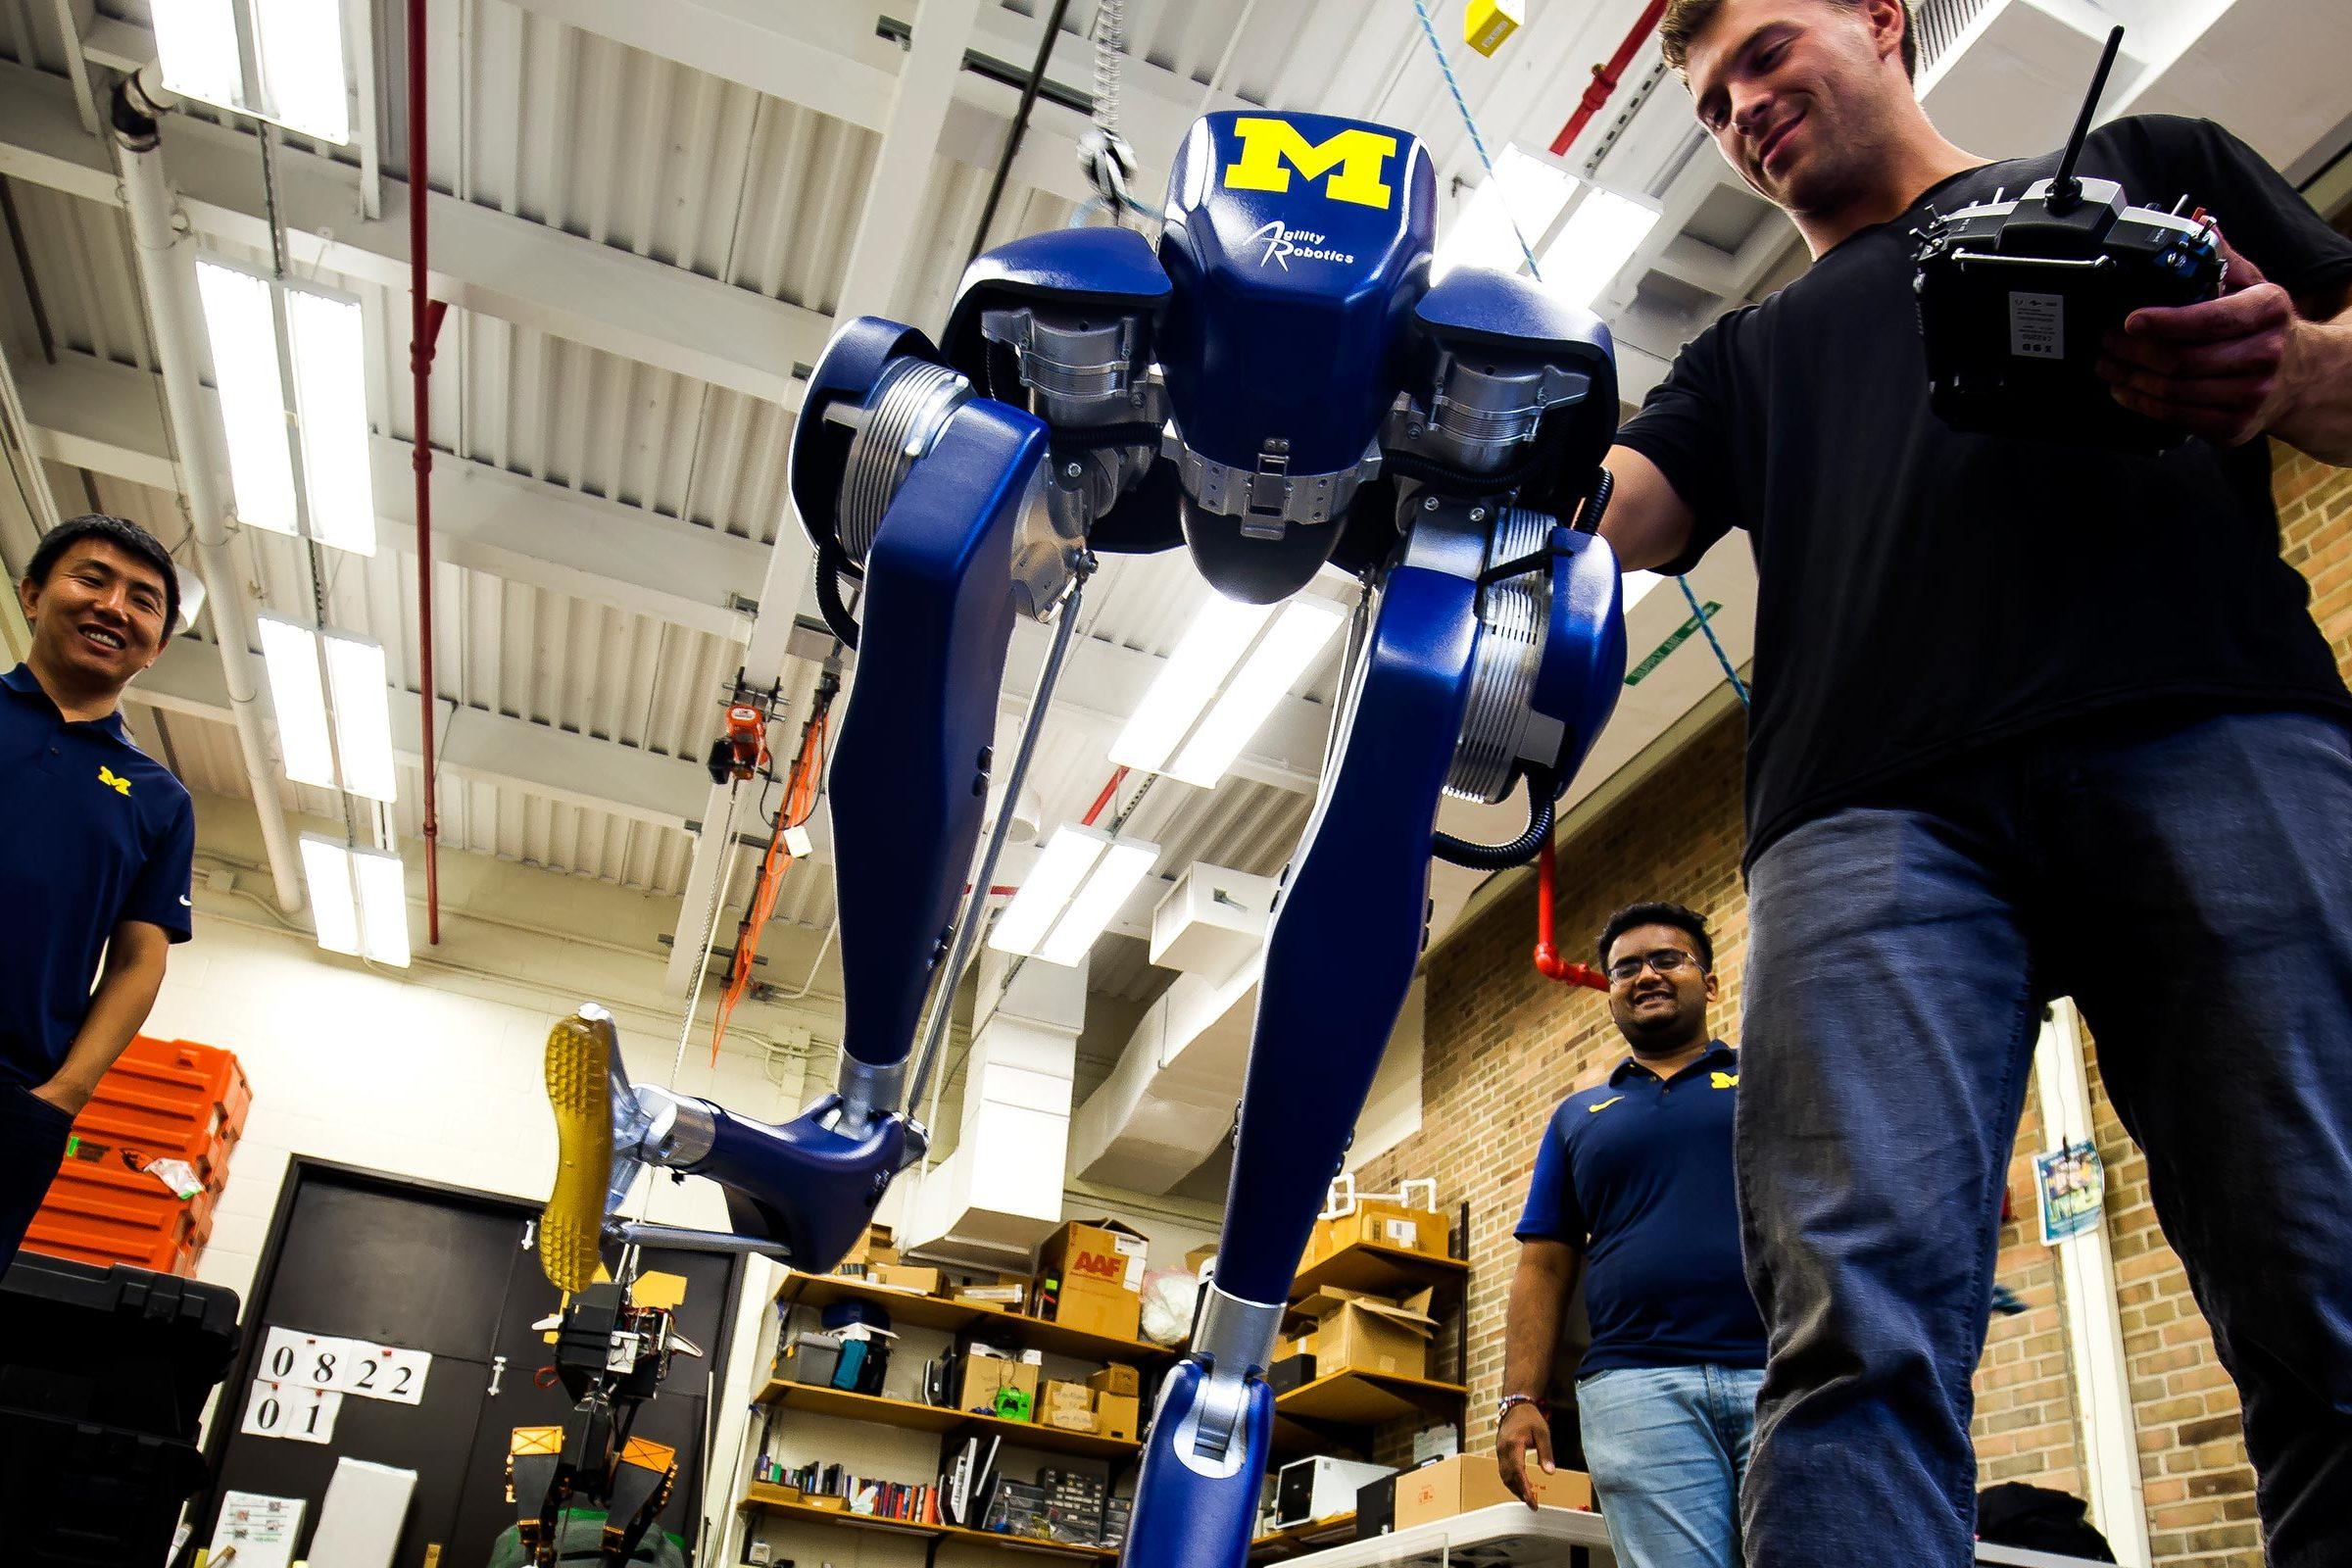 Latest two-legged walking robot arrives at Michigan